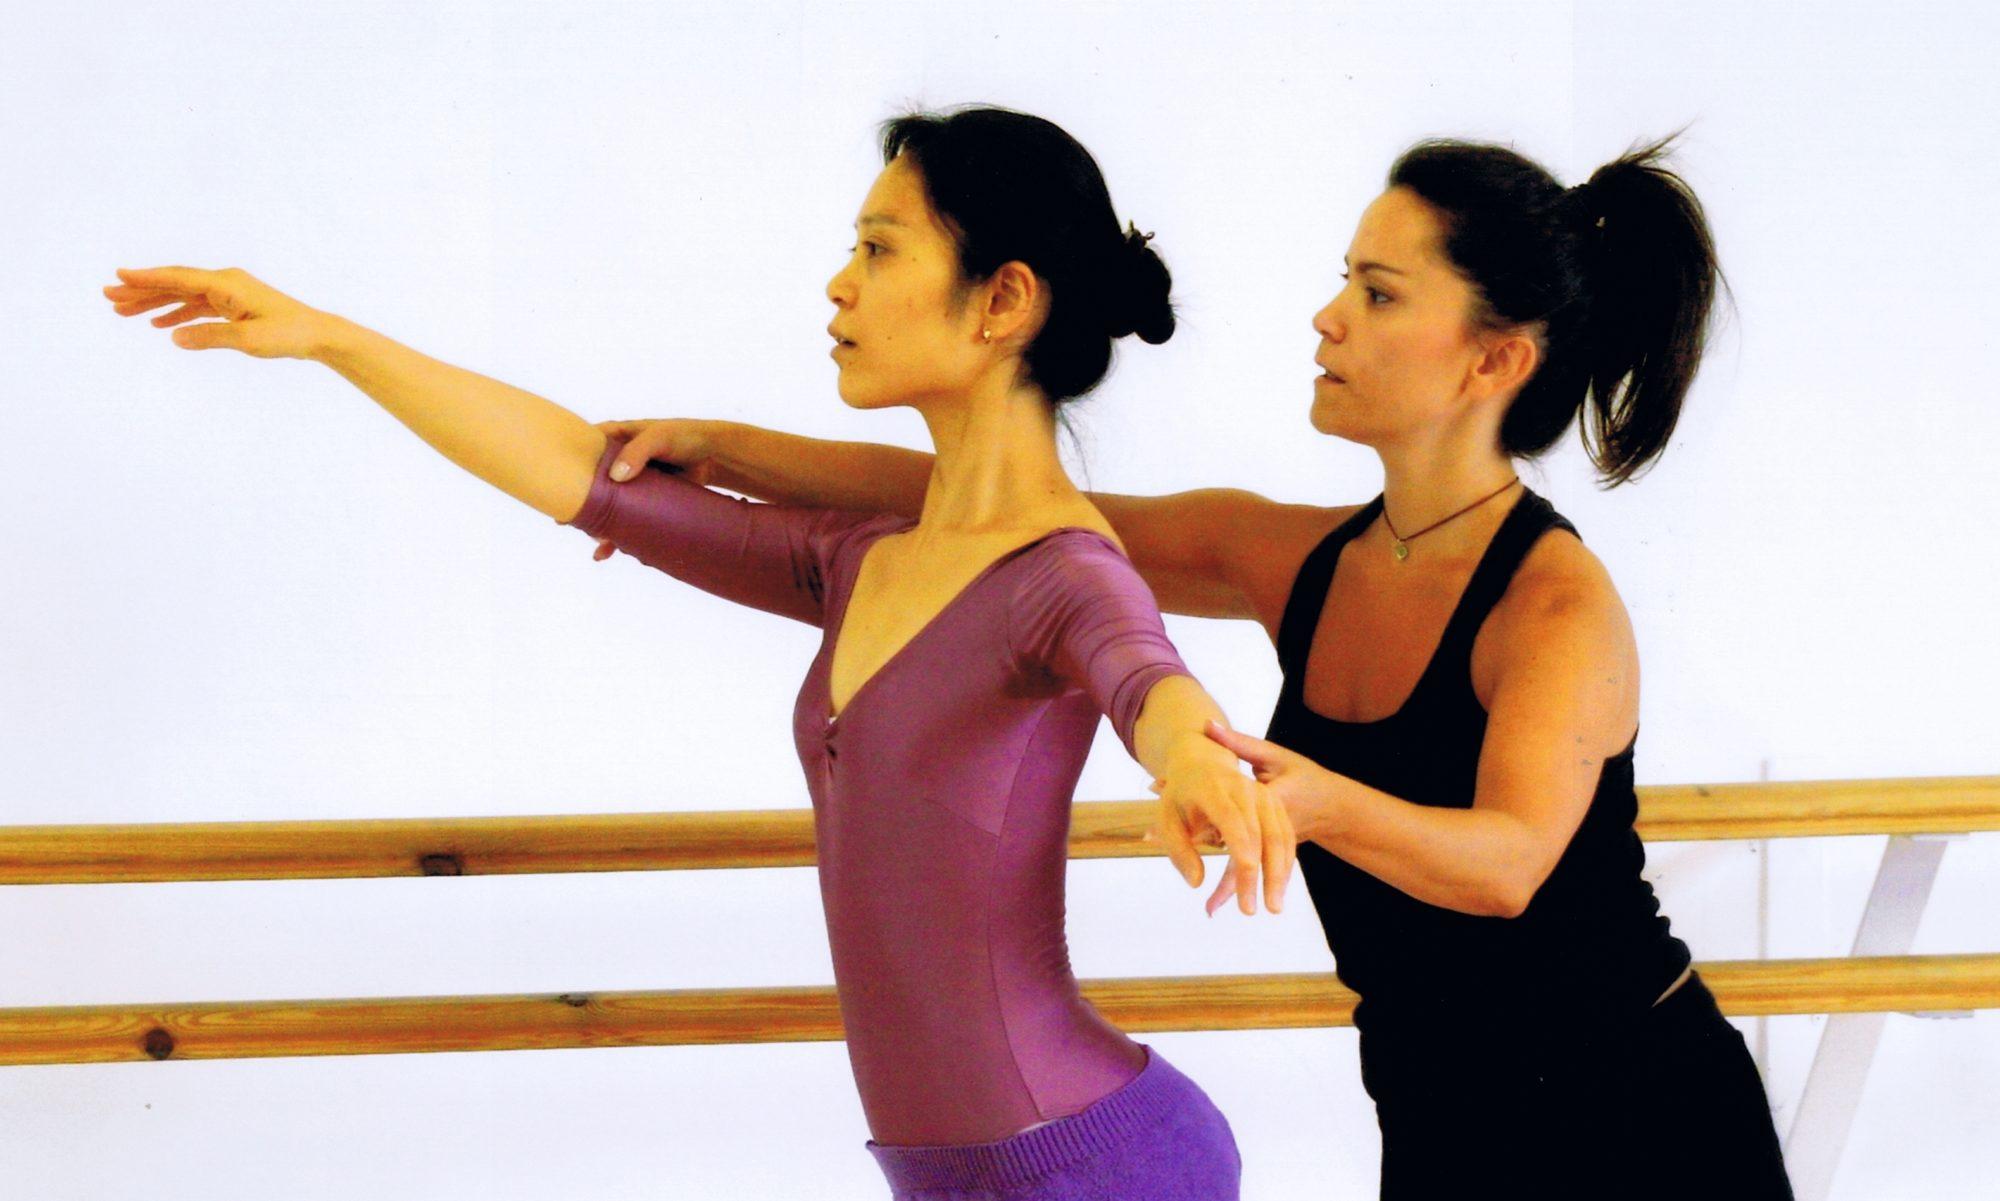 ballet classes with Christina-Maria Mittelmaier